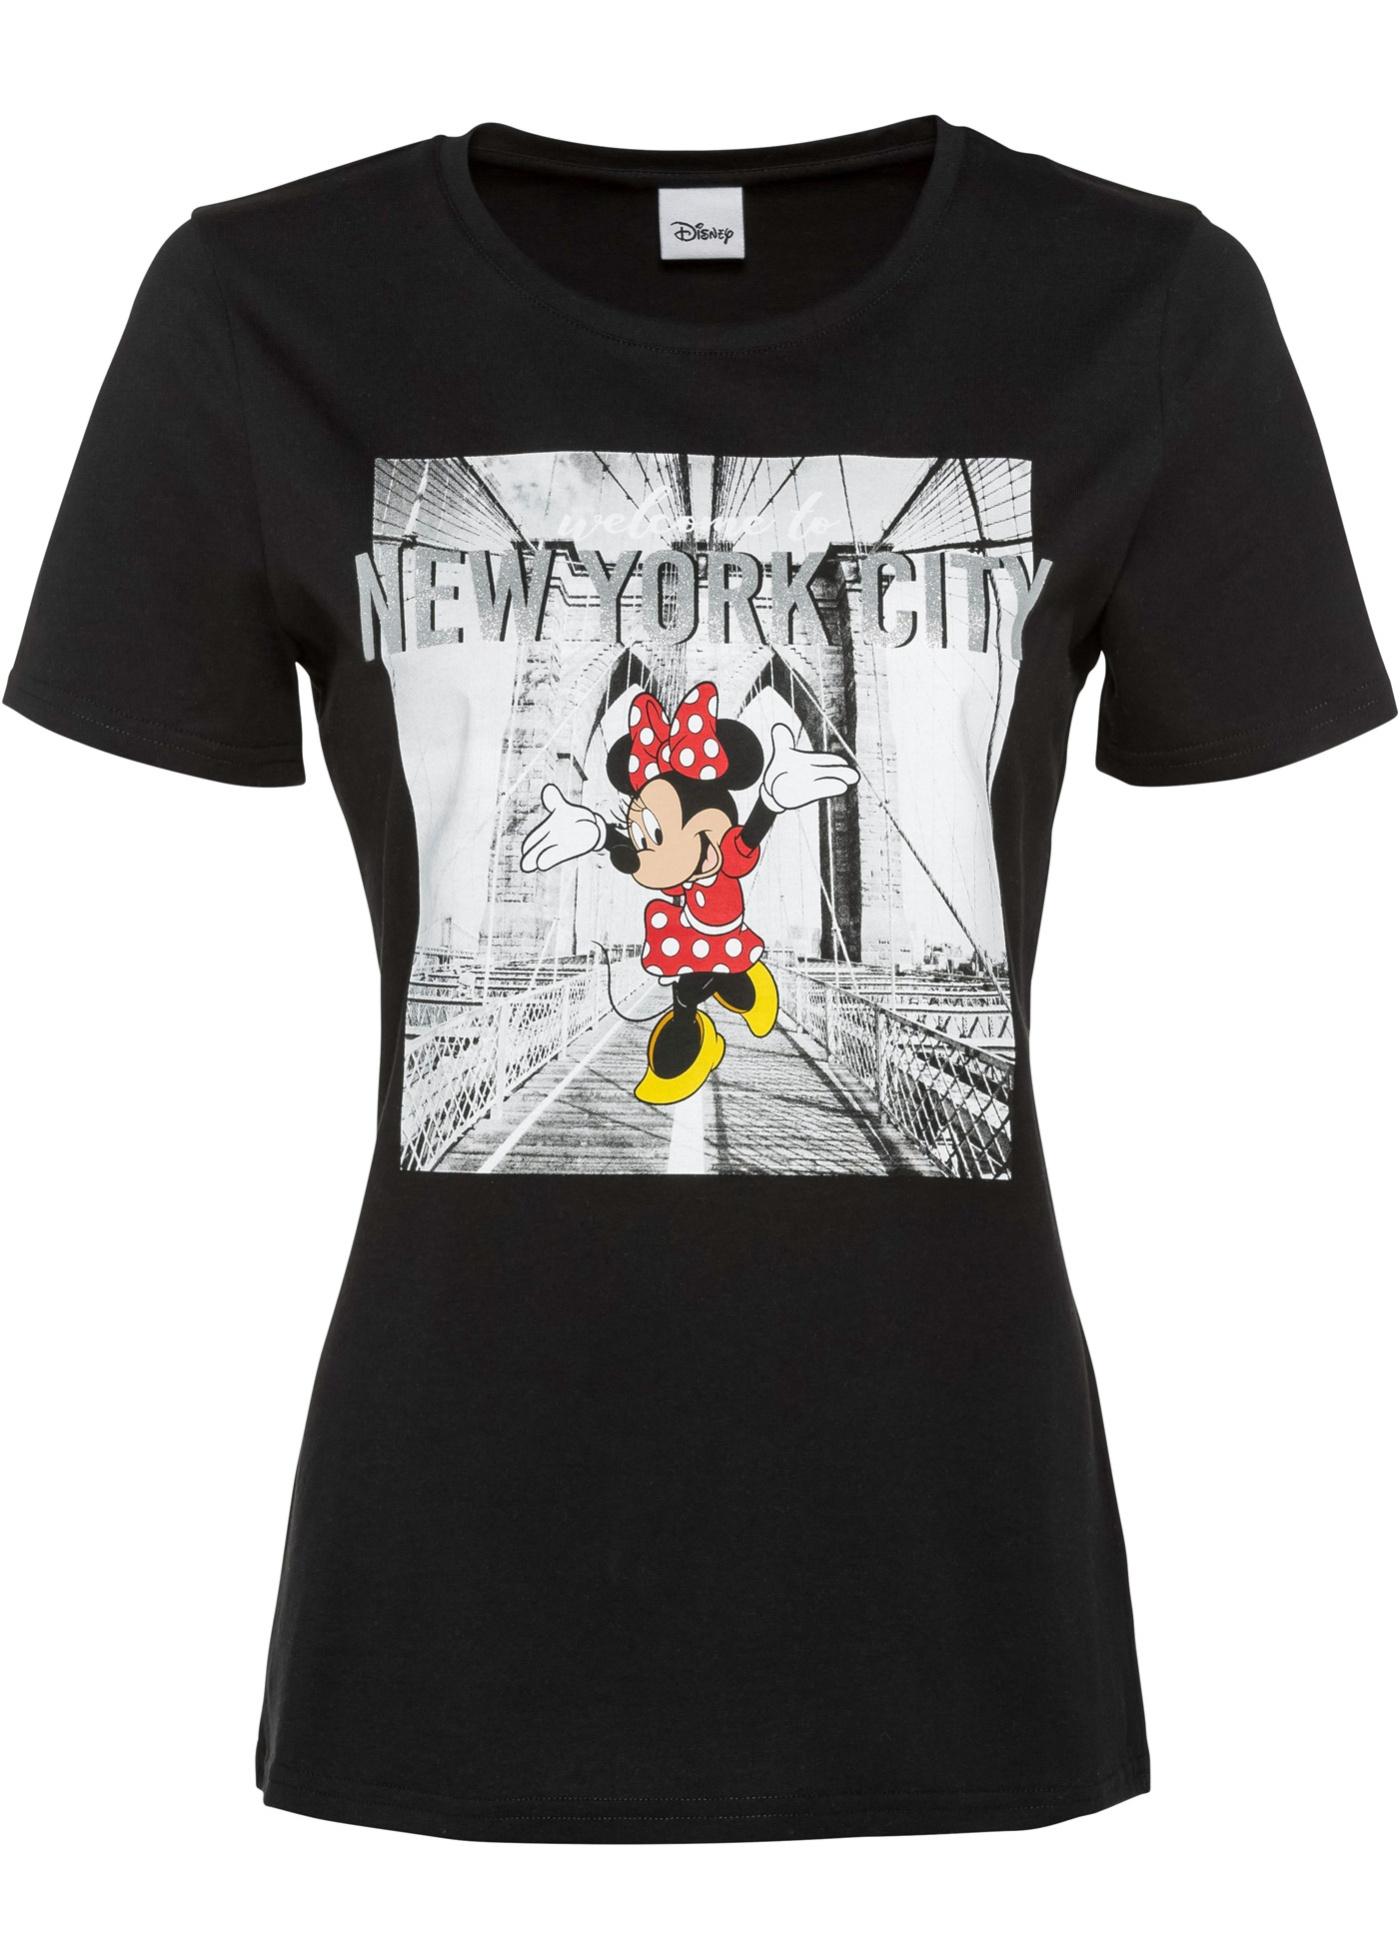 T-shirt con Mickey Mouse (Nero) - Disney